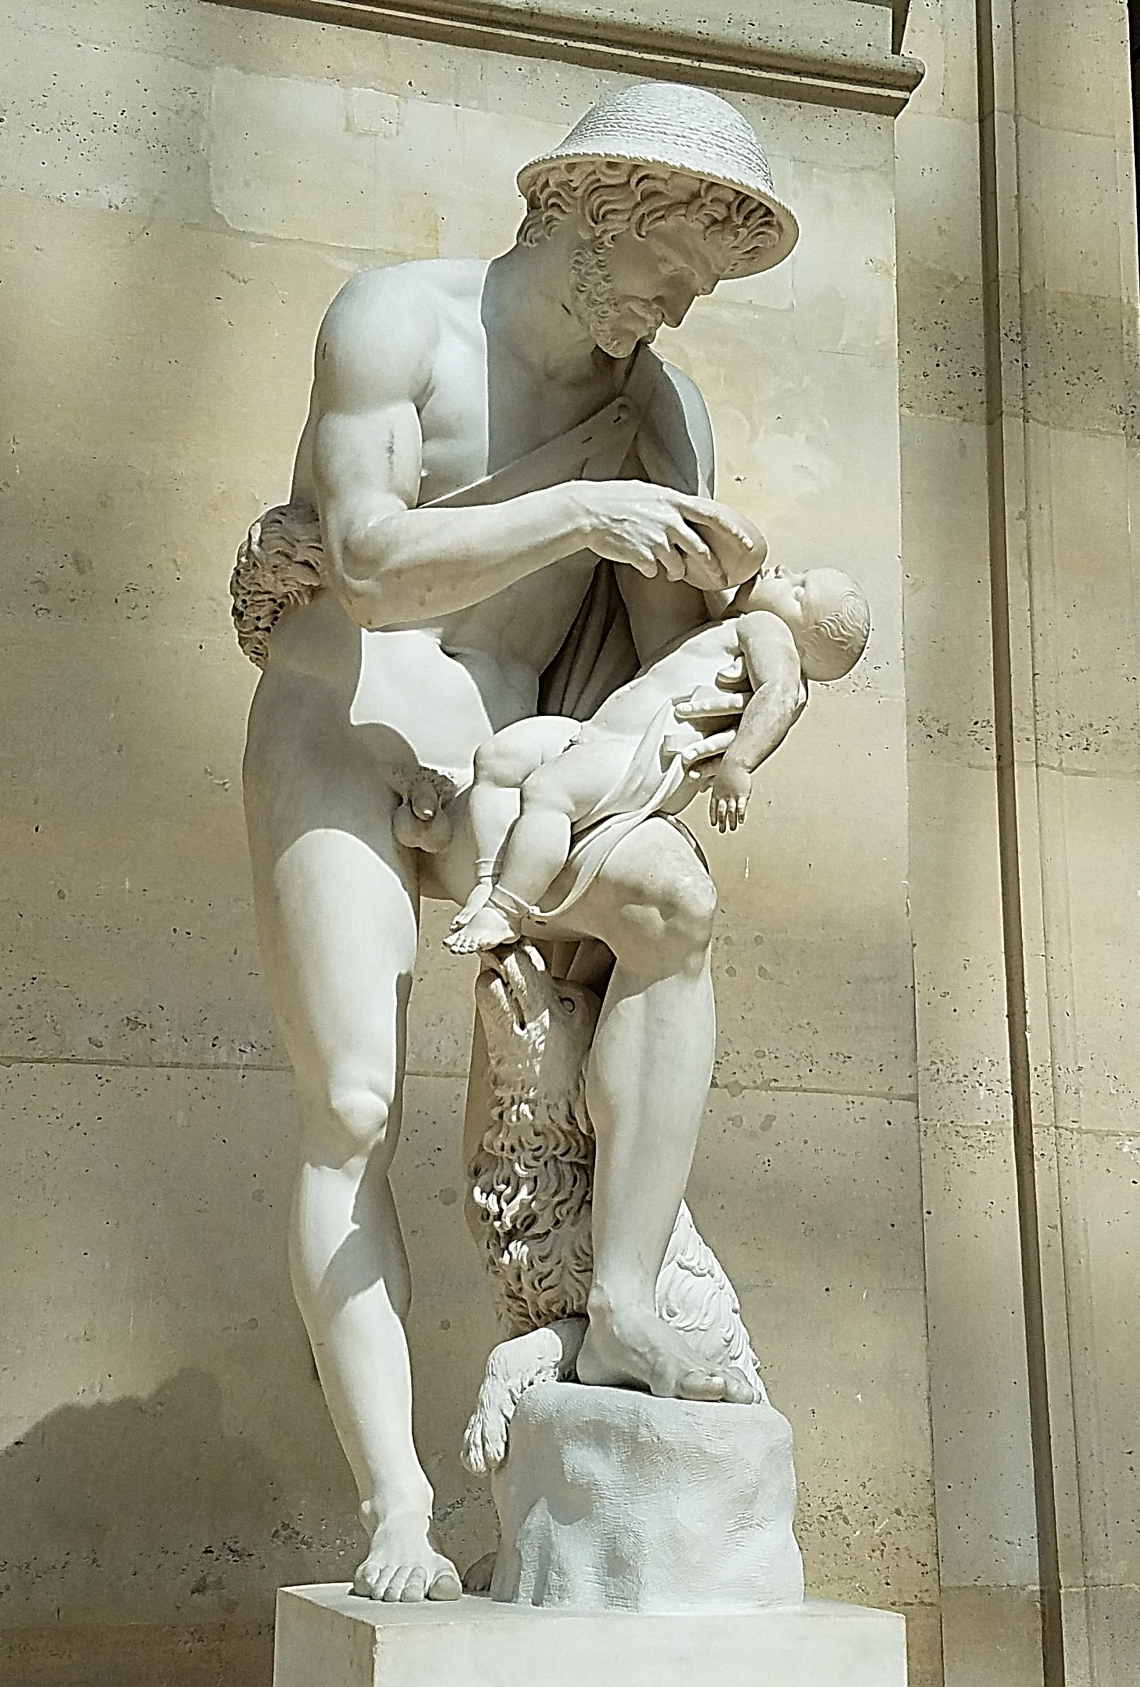 00-Saintly-Louvre-20160415_142026A